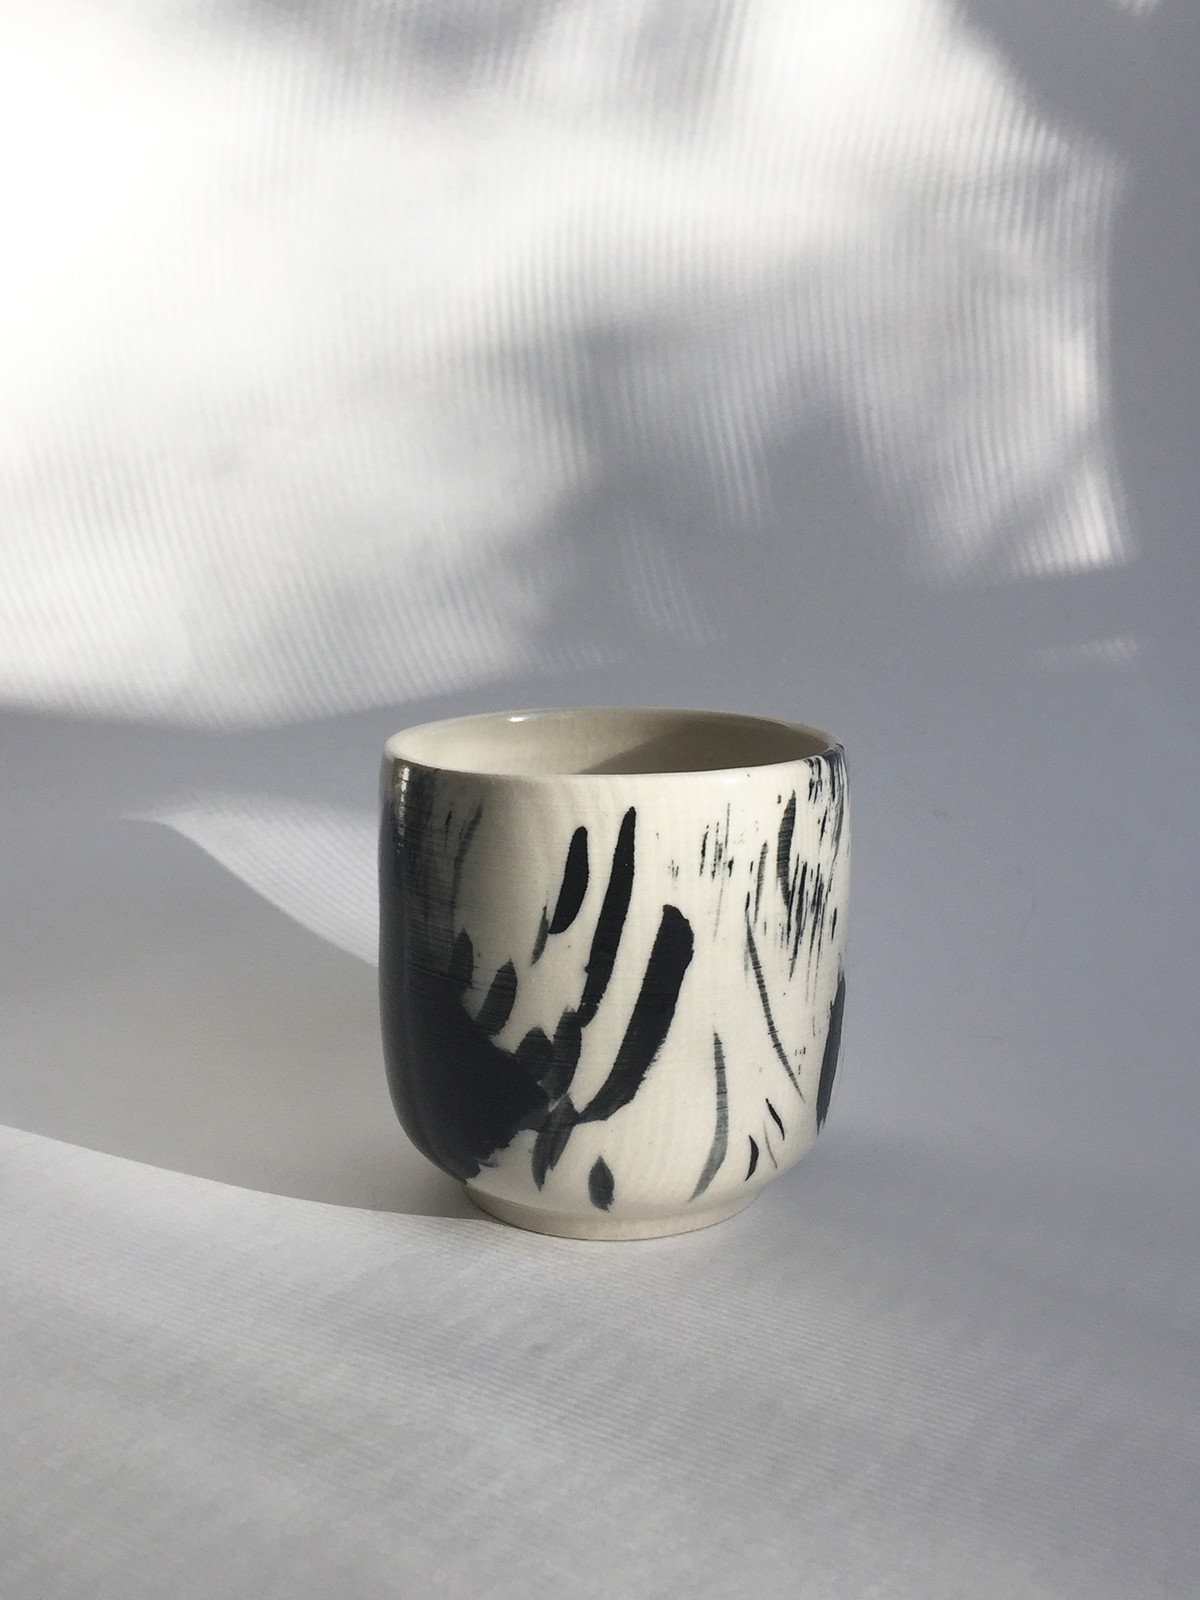 17-cup-brush-05.jpg